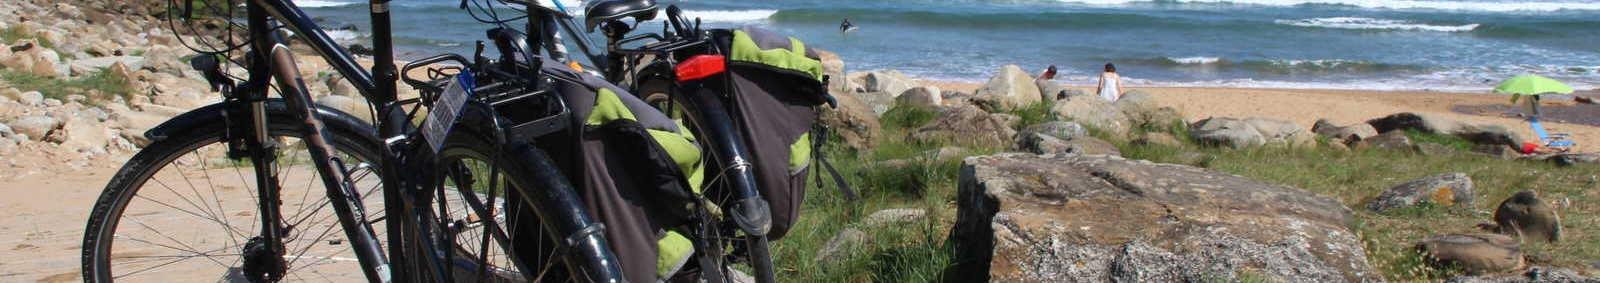 Bikes in Playa Espana